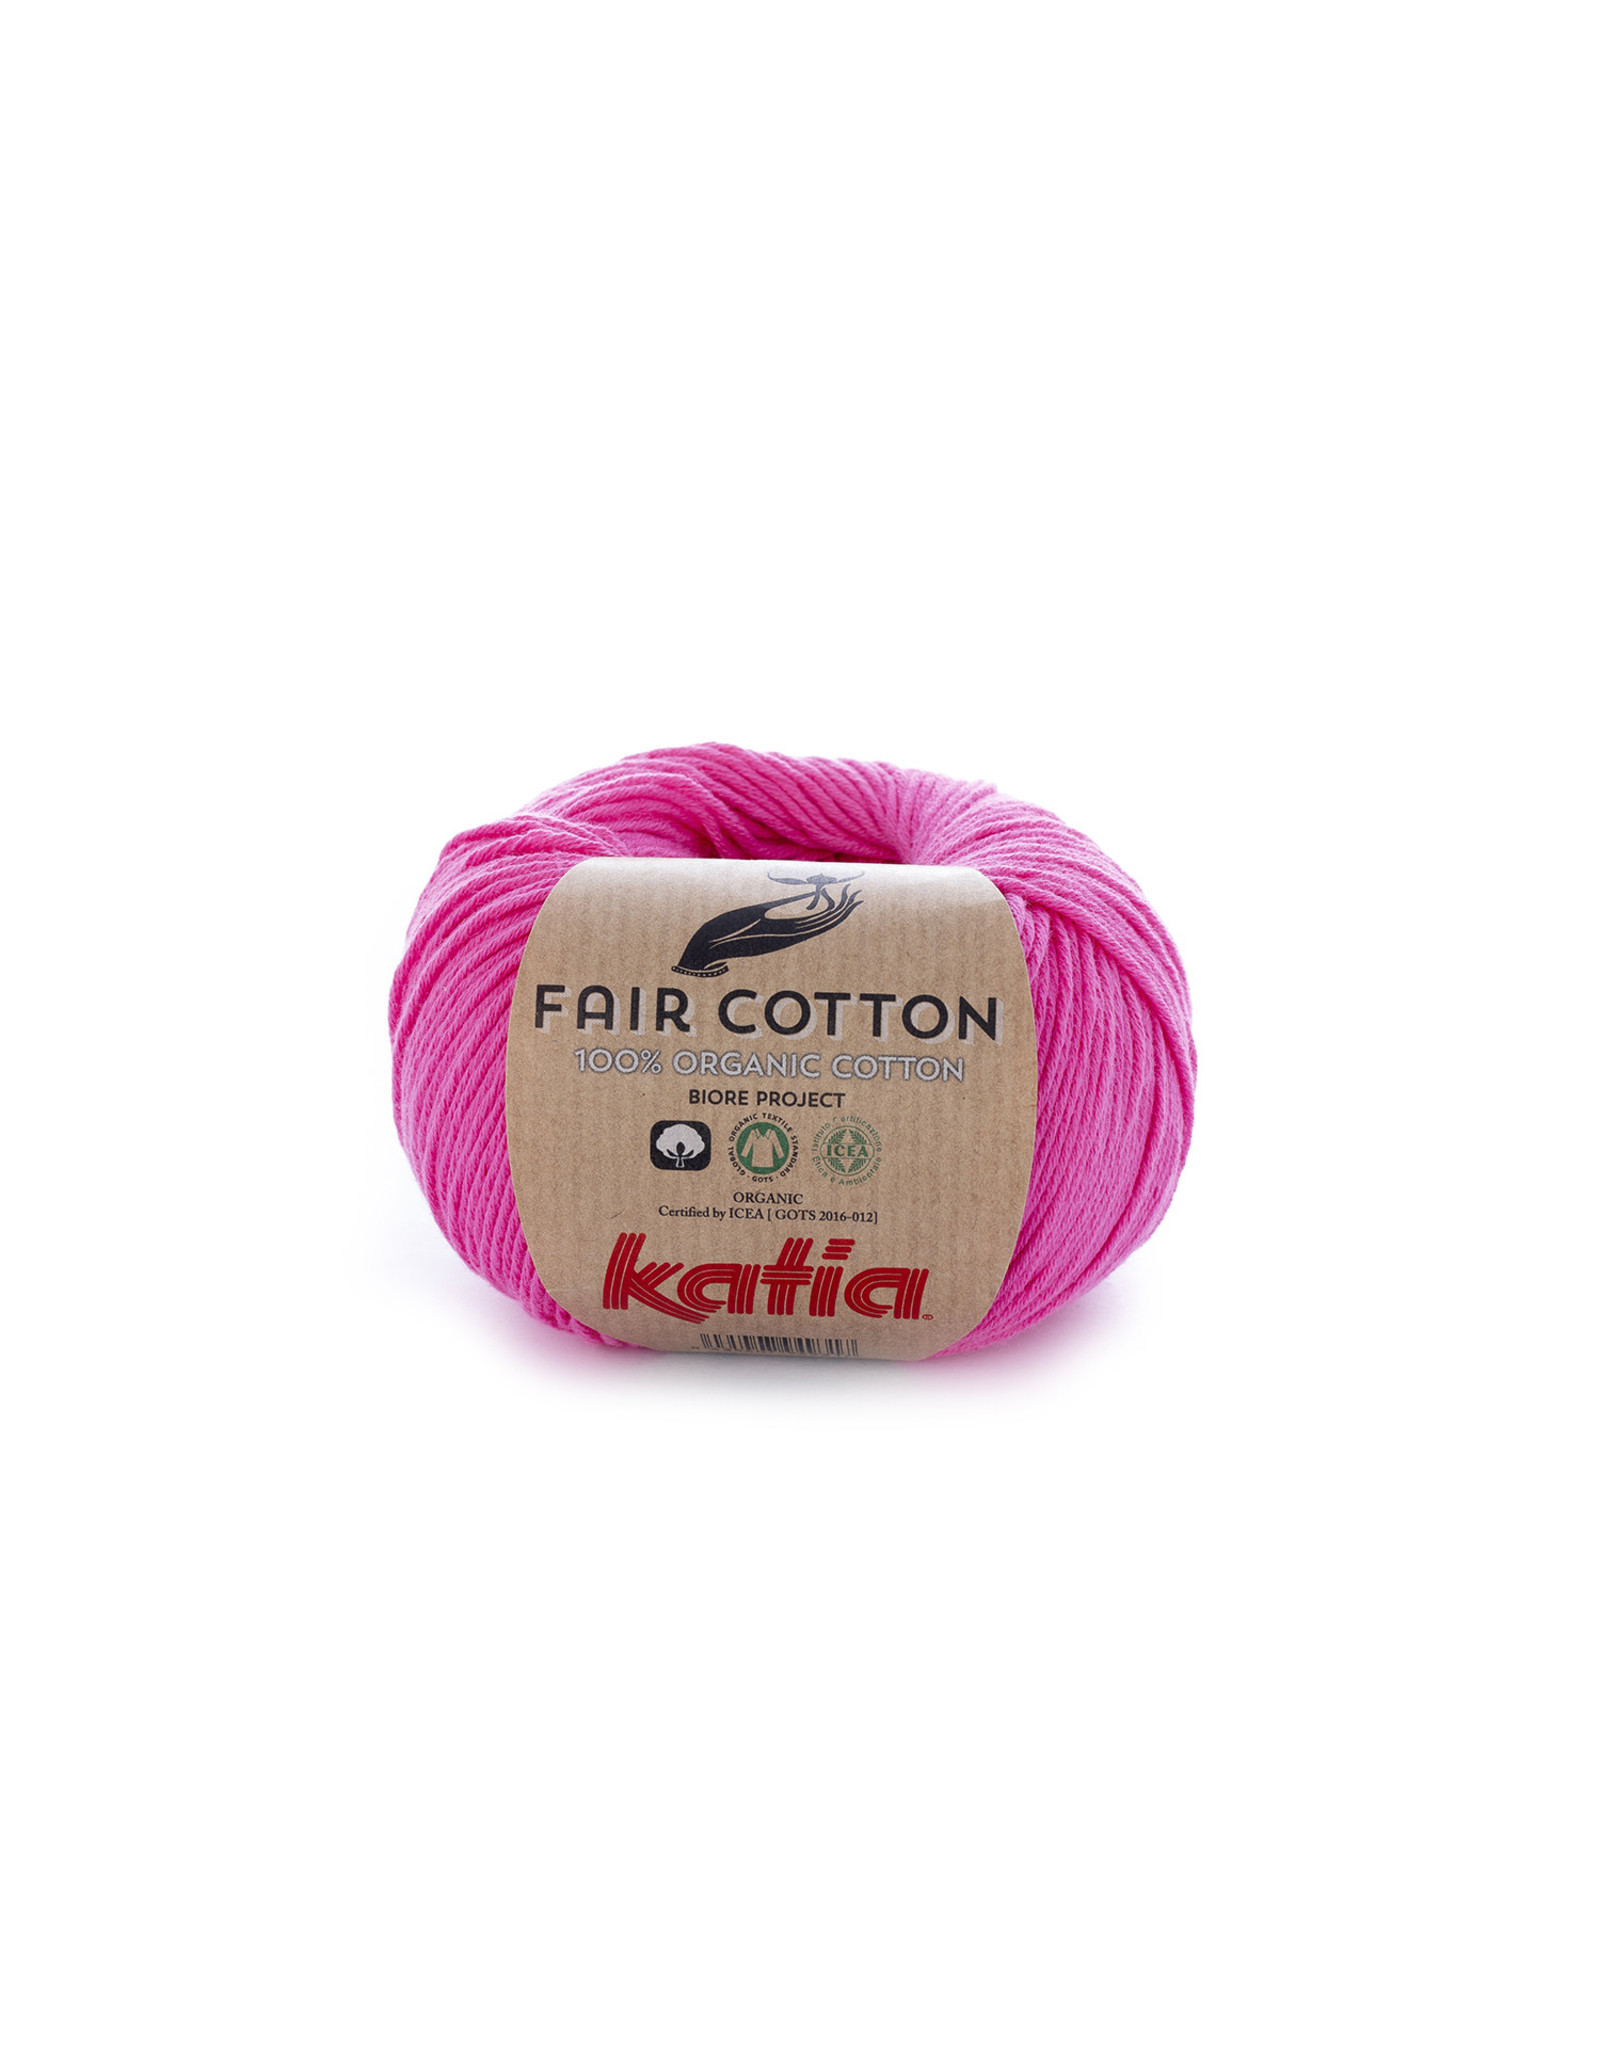 Katia Katia Fair Cotton 33 - roze - 1 bol = 50 gr. = 155 m. - 100% biol. katoen